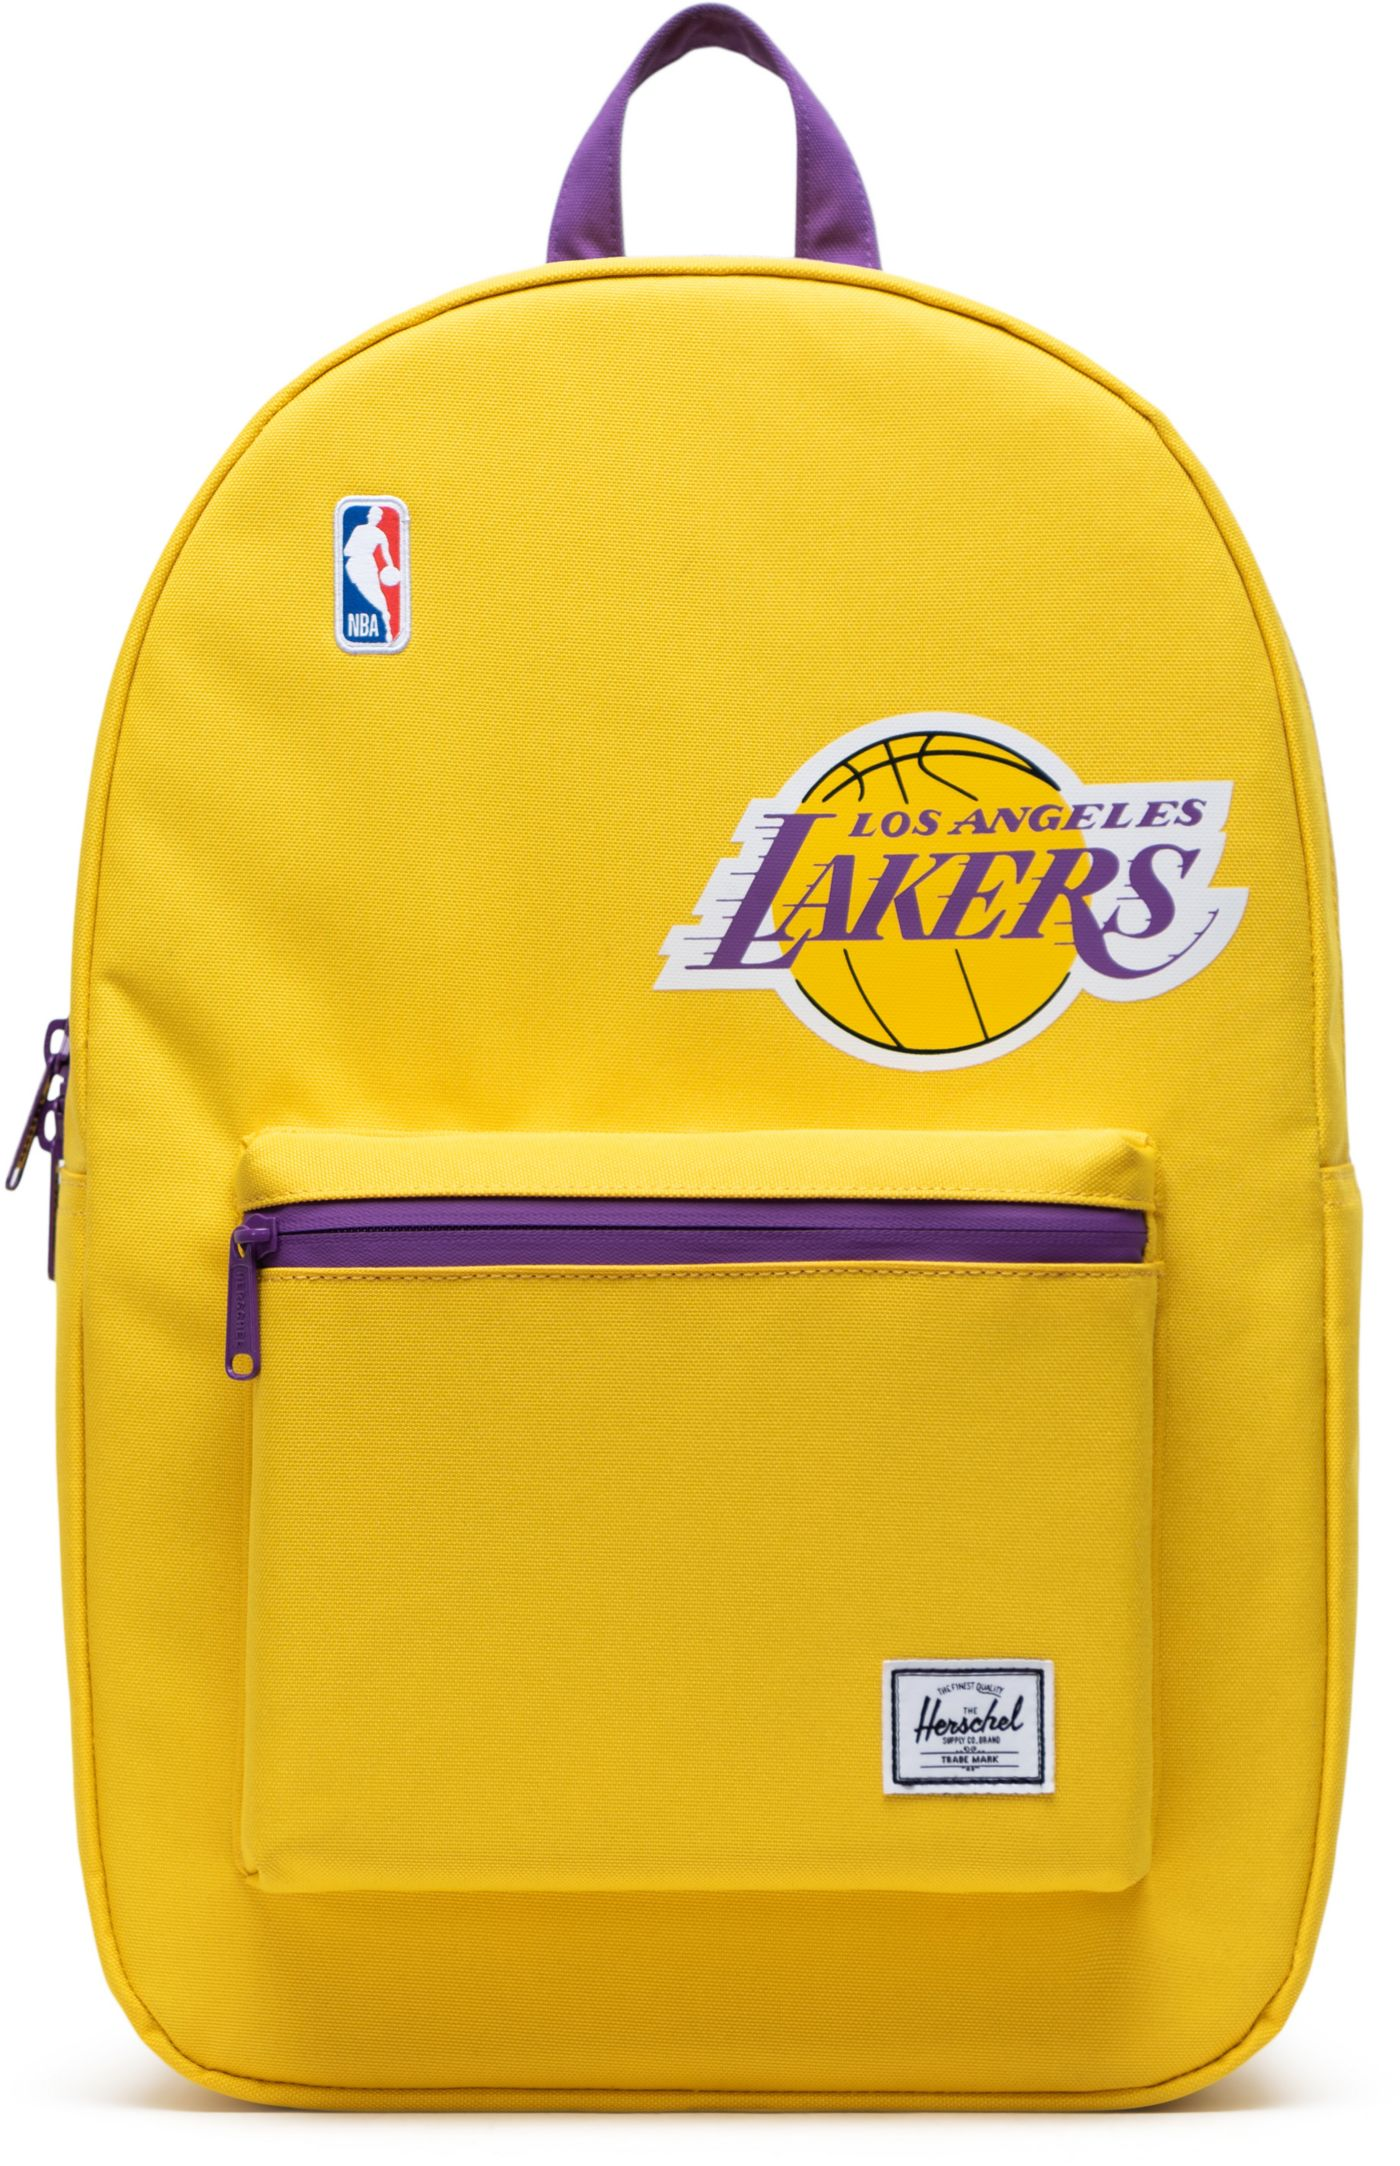 Herschel Los Angeles Lakers Gold Backpack